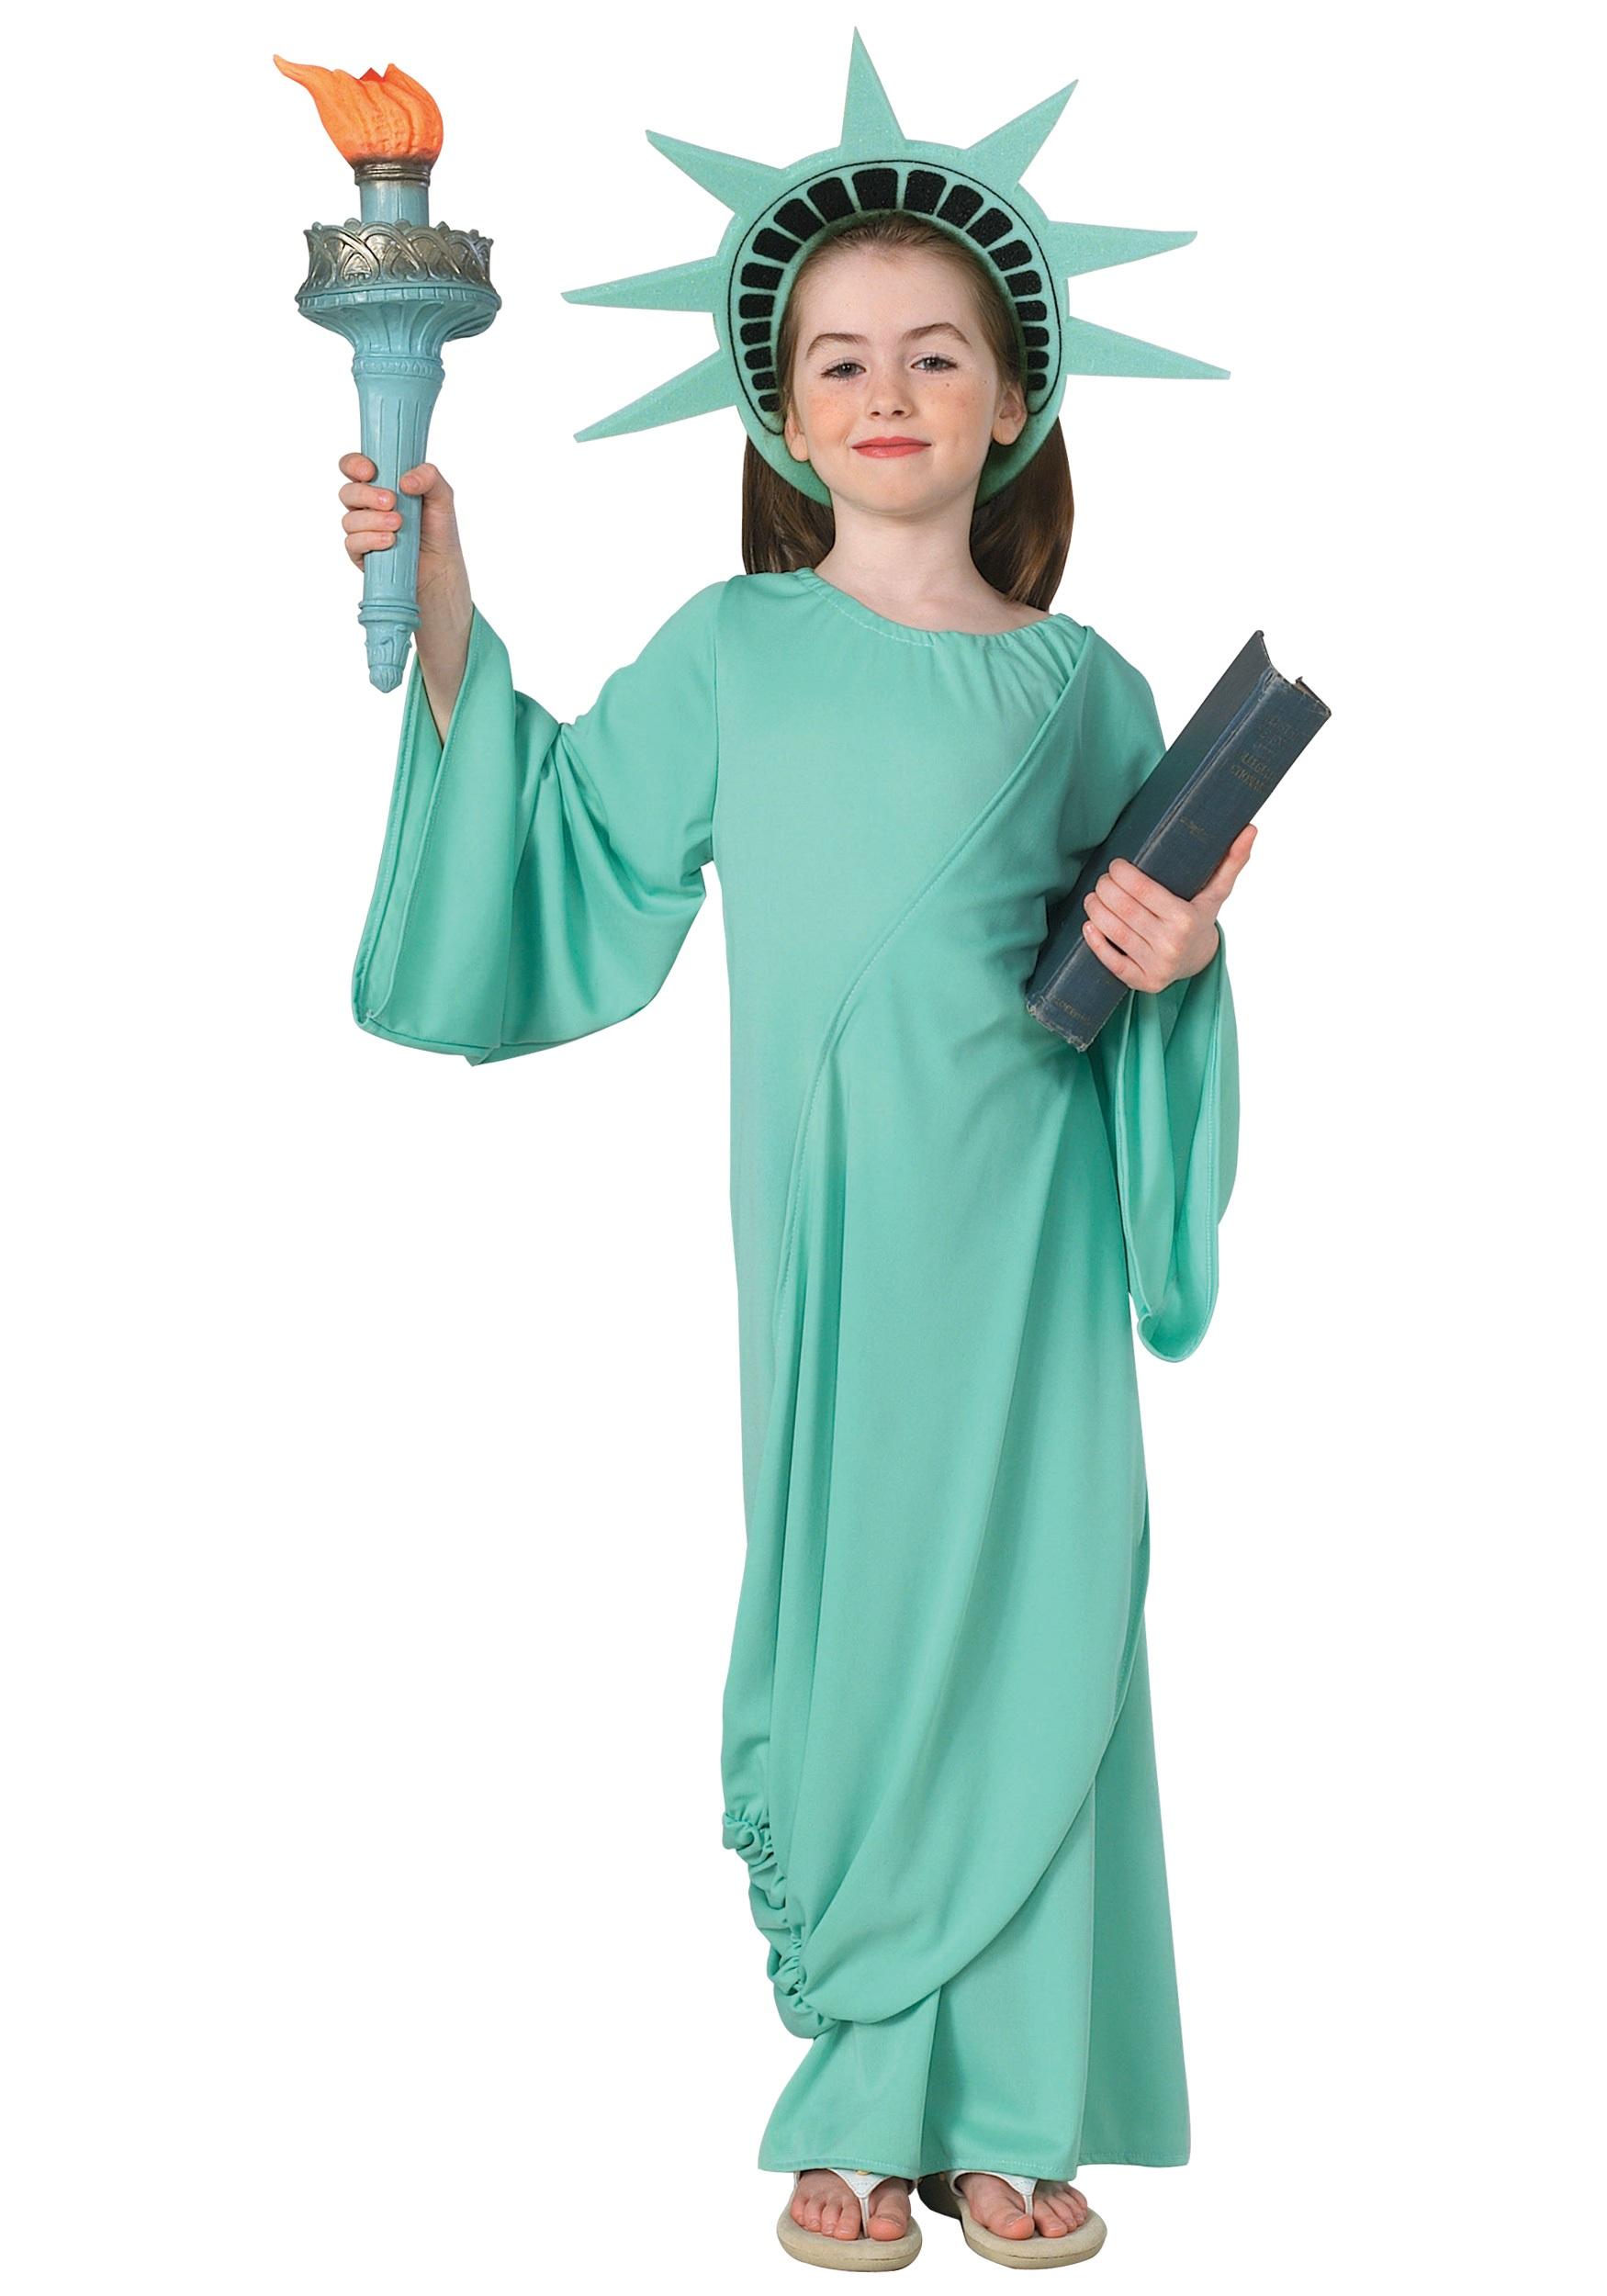 LIL MISS LIBERTY TIARA STATUE OF LIBERTY HEADPIECE CHILD COSTUME ACCESSORY